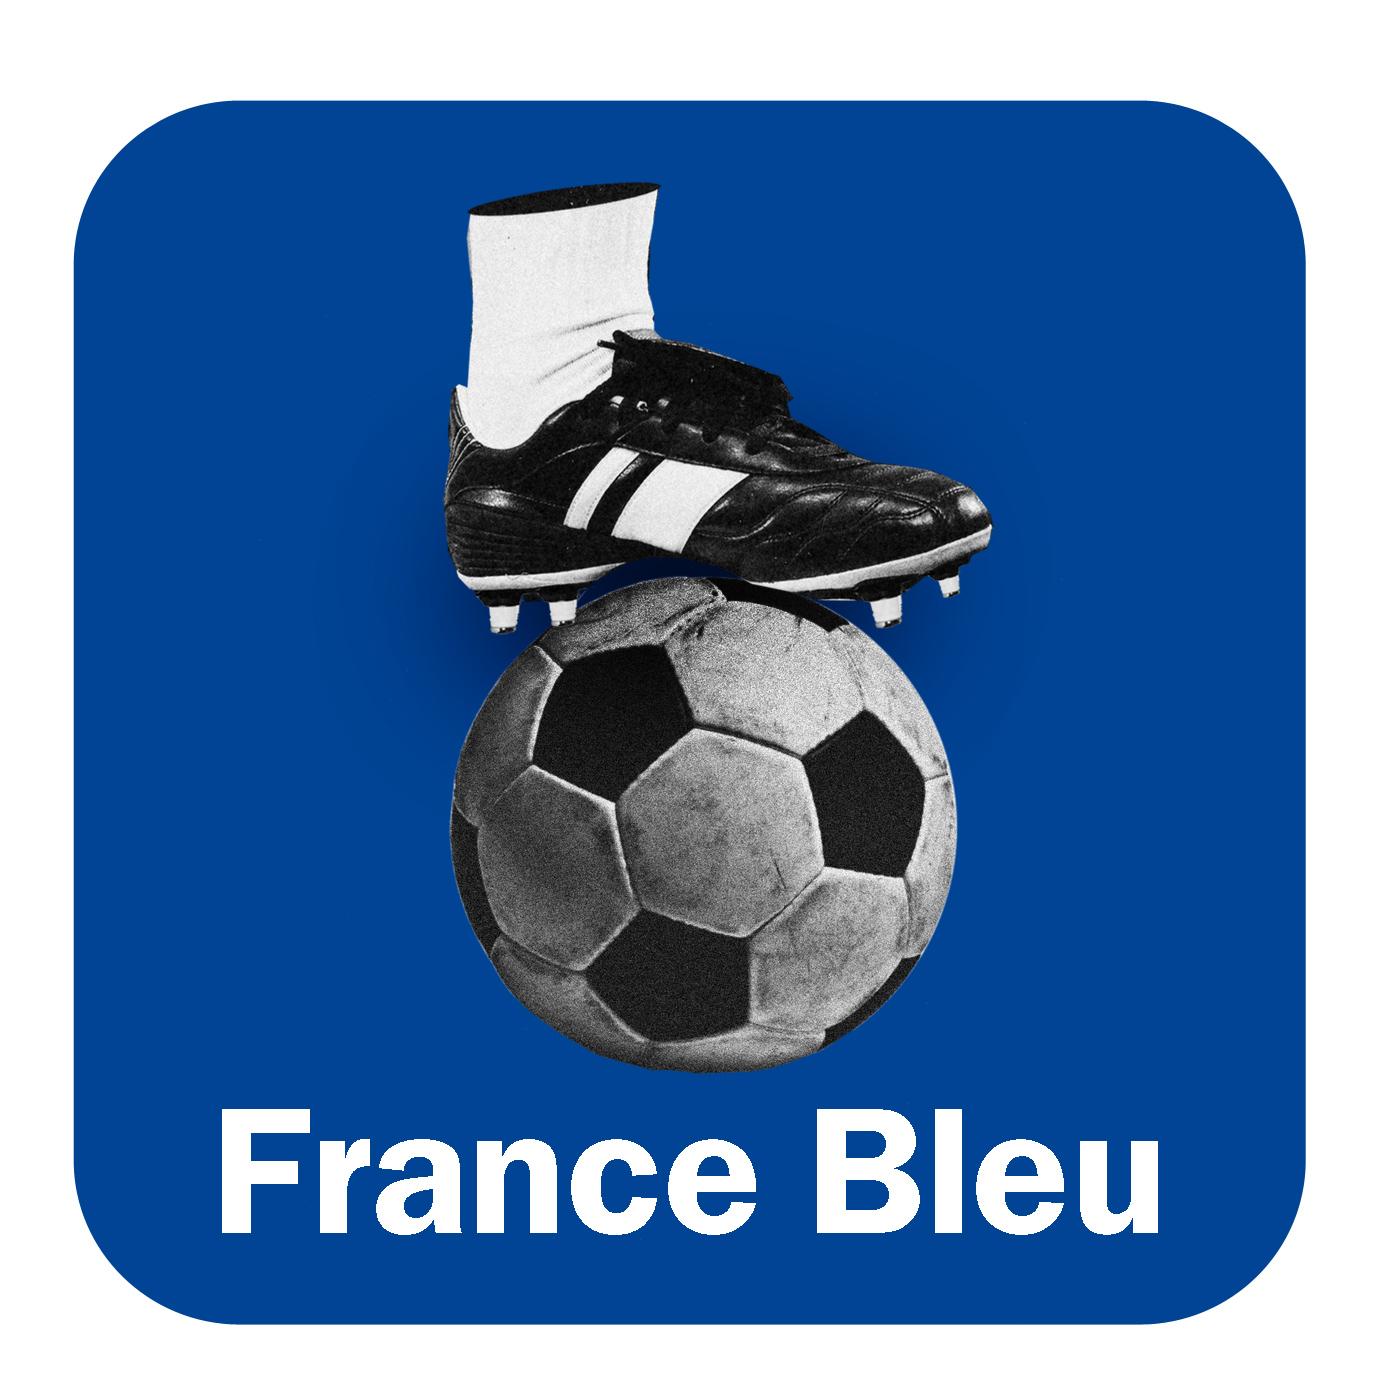 Club Foot Marseille France Bleu Provence